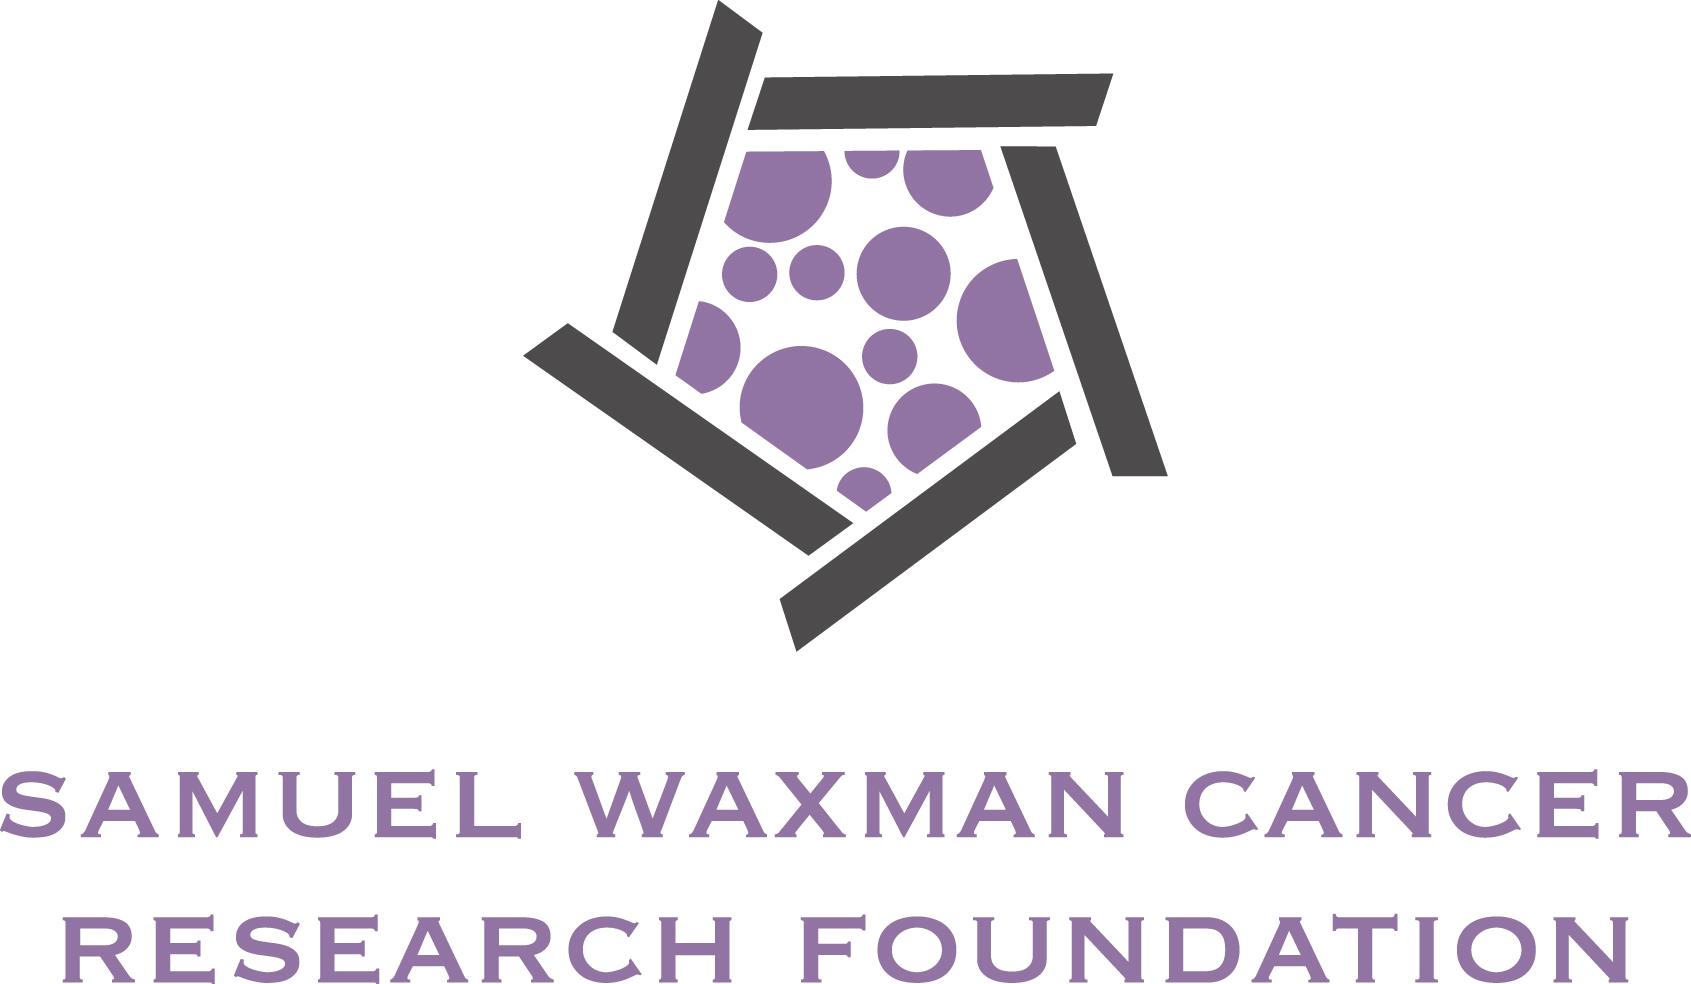 Samuel Waxman Cancer Research Foundation